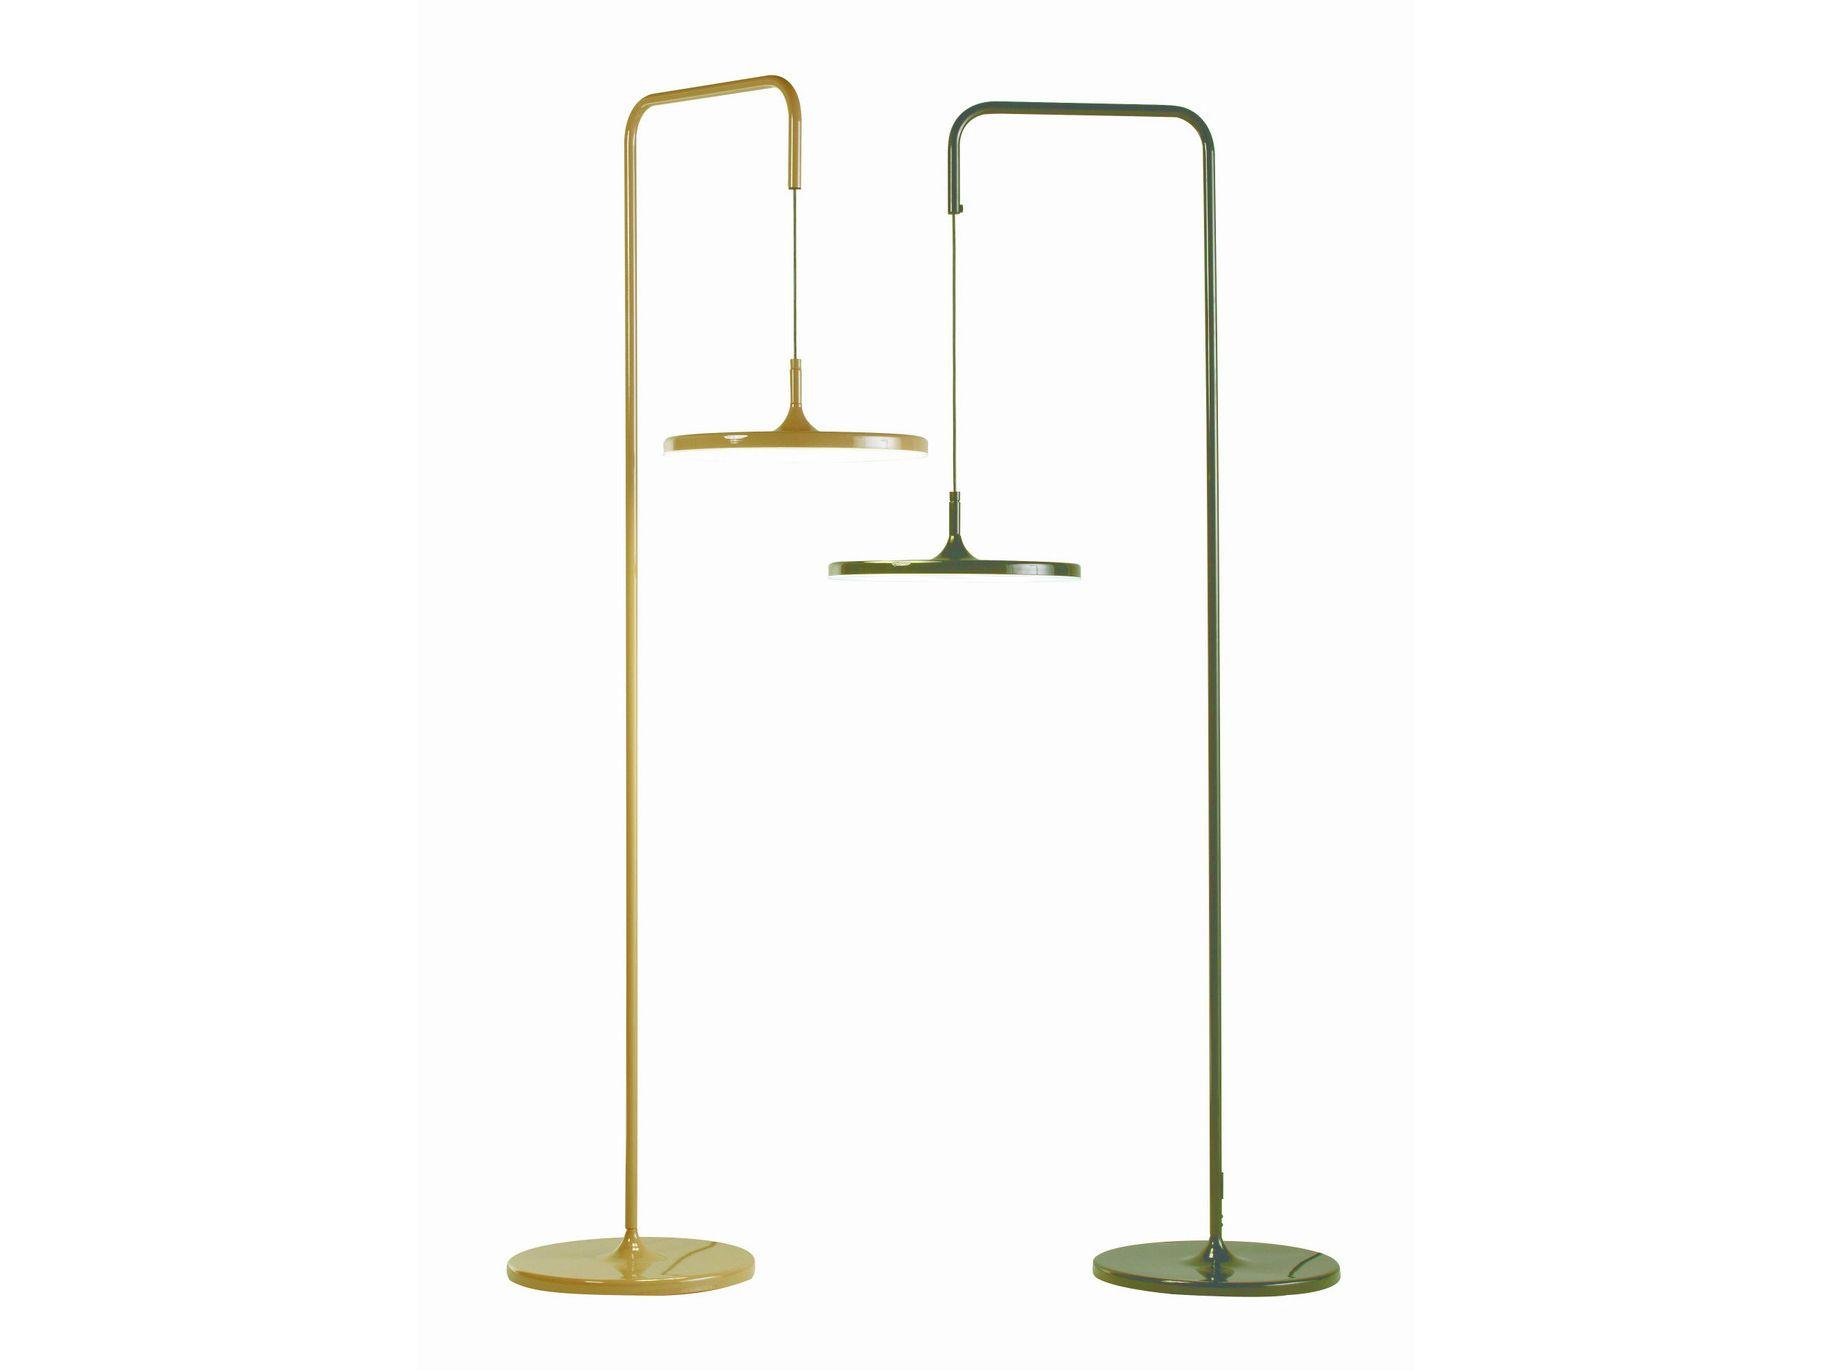 YOYO Direct Light Floor Lamp By ROCHE BOBOIS Design Hitoshi Makino